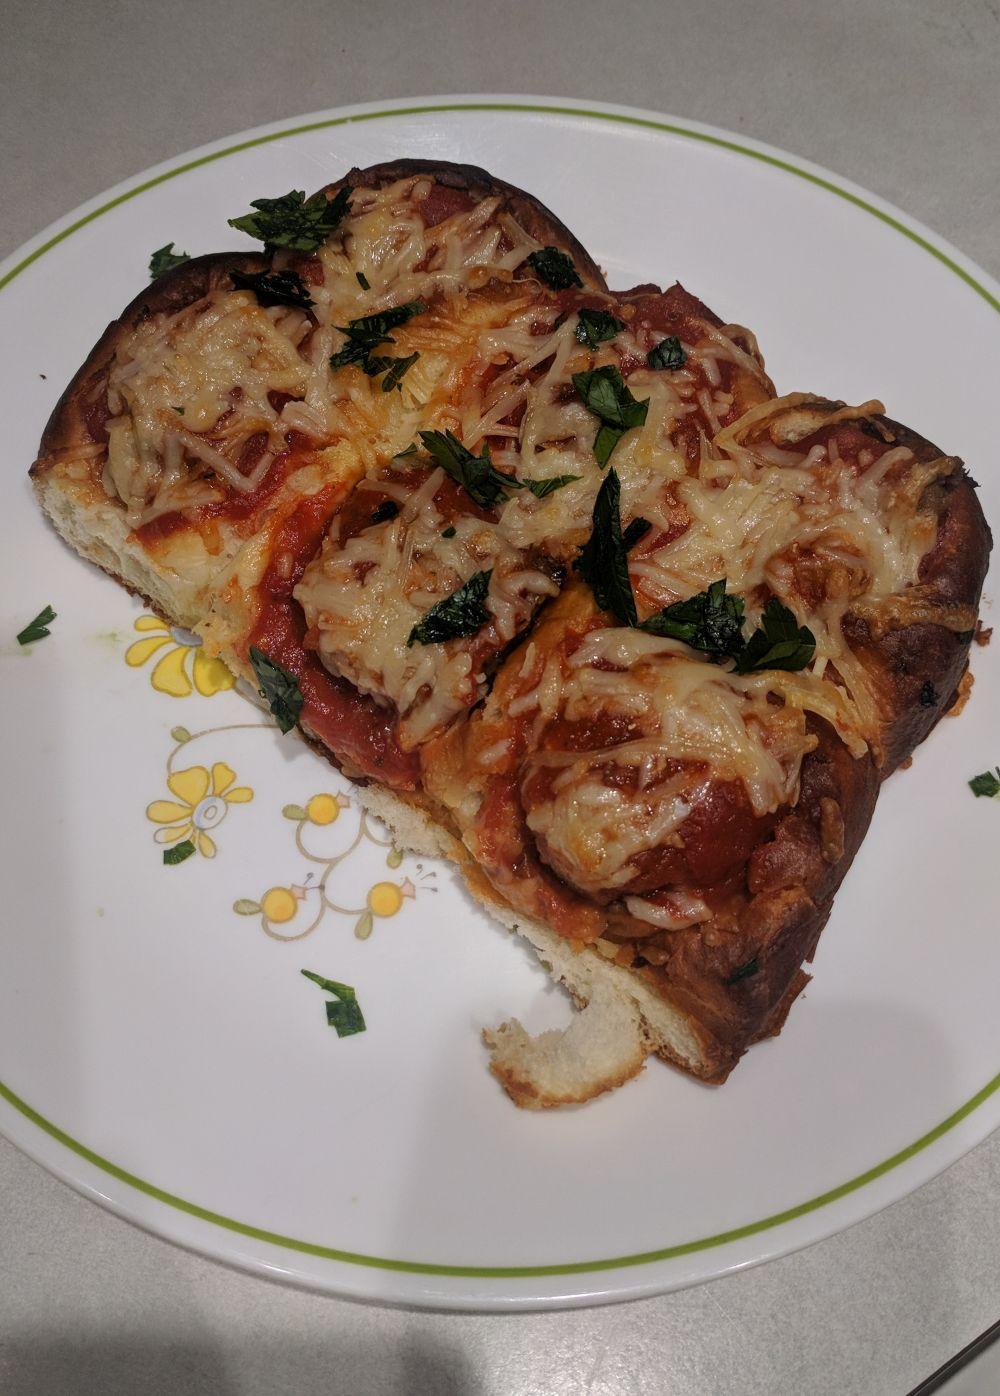 Meatball-Stuffed Garlic Bread Sliders Electra